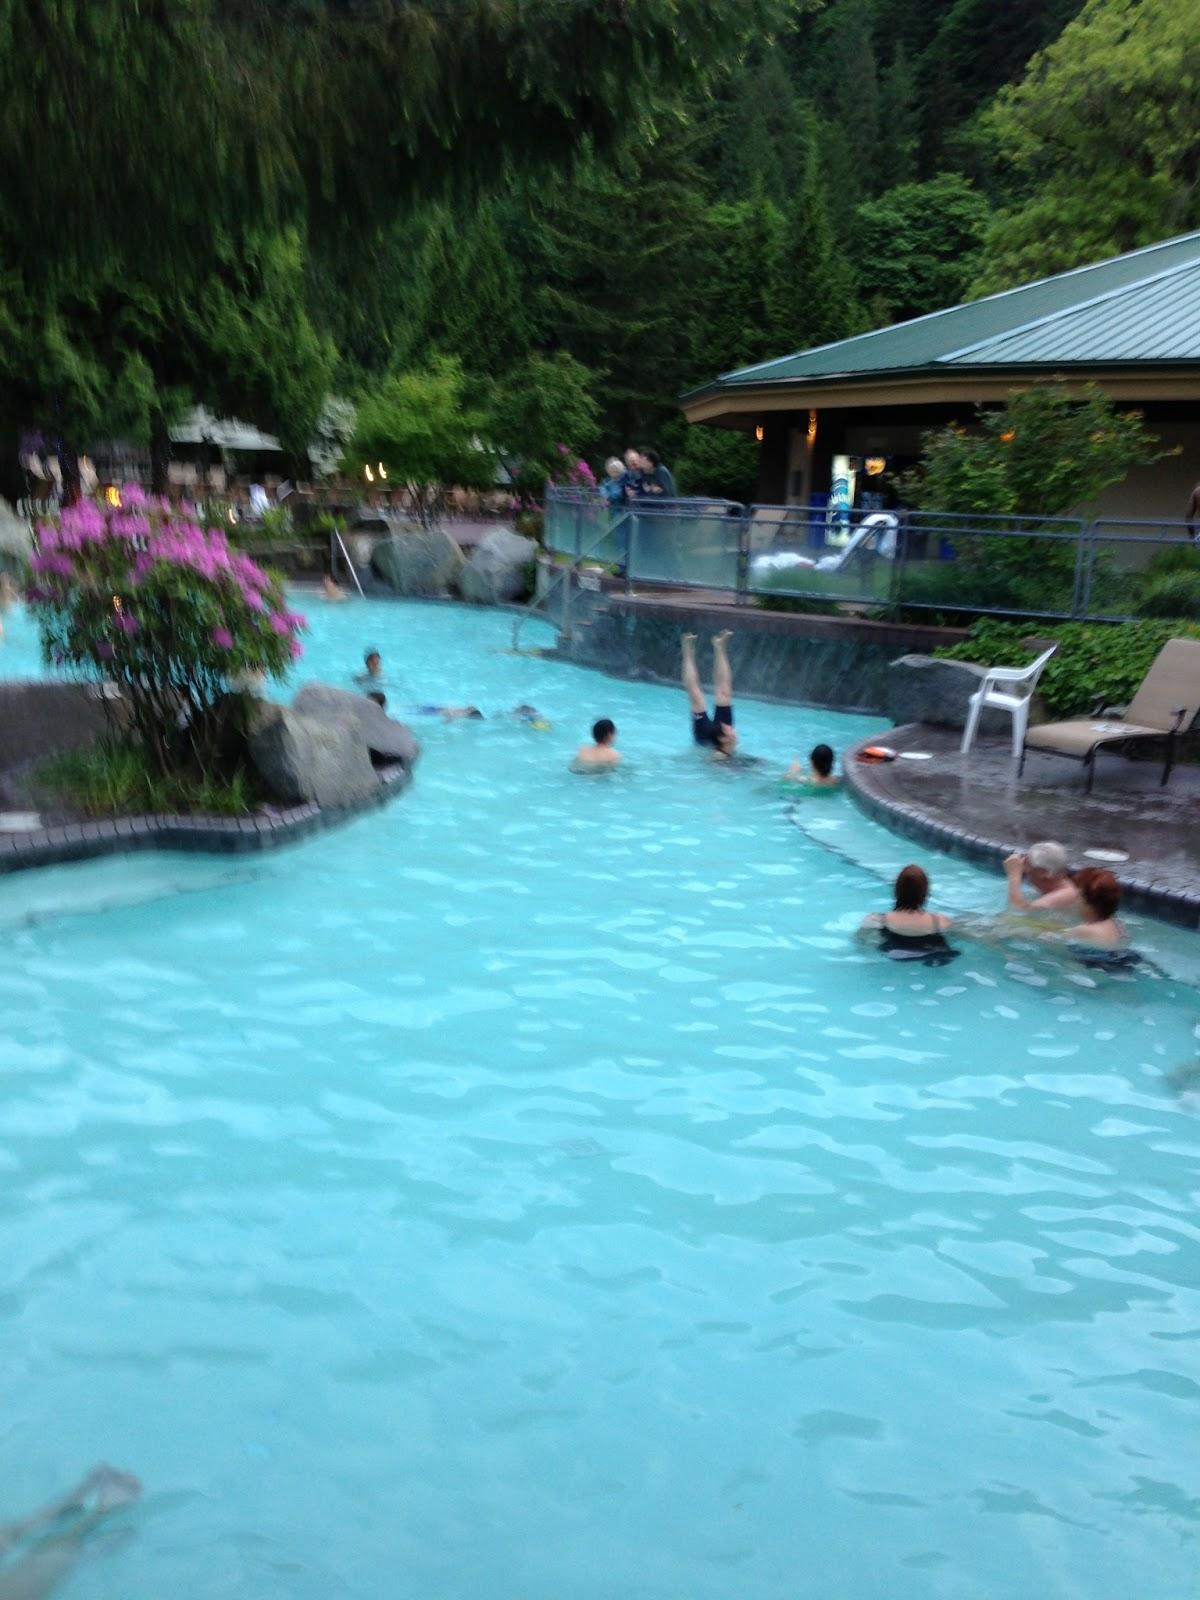 Spa Girl Spa Girl spotted at Harrison Hot Springs Resort